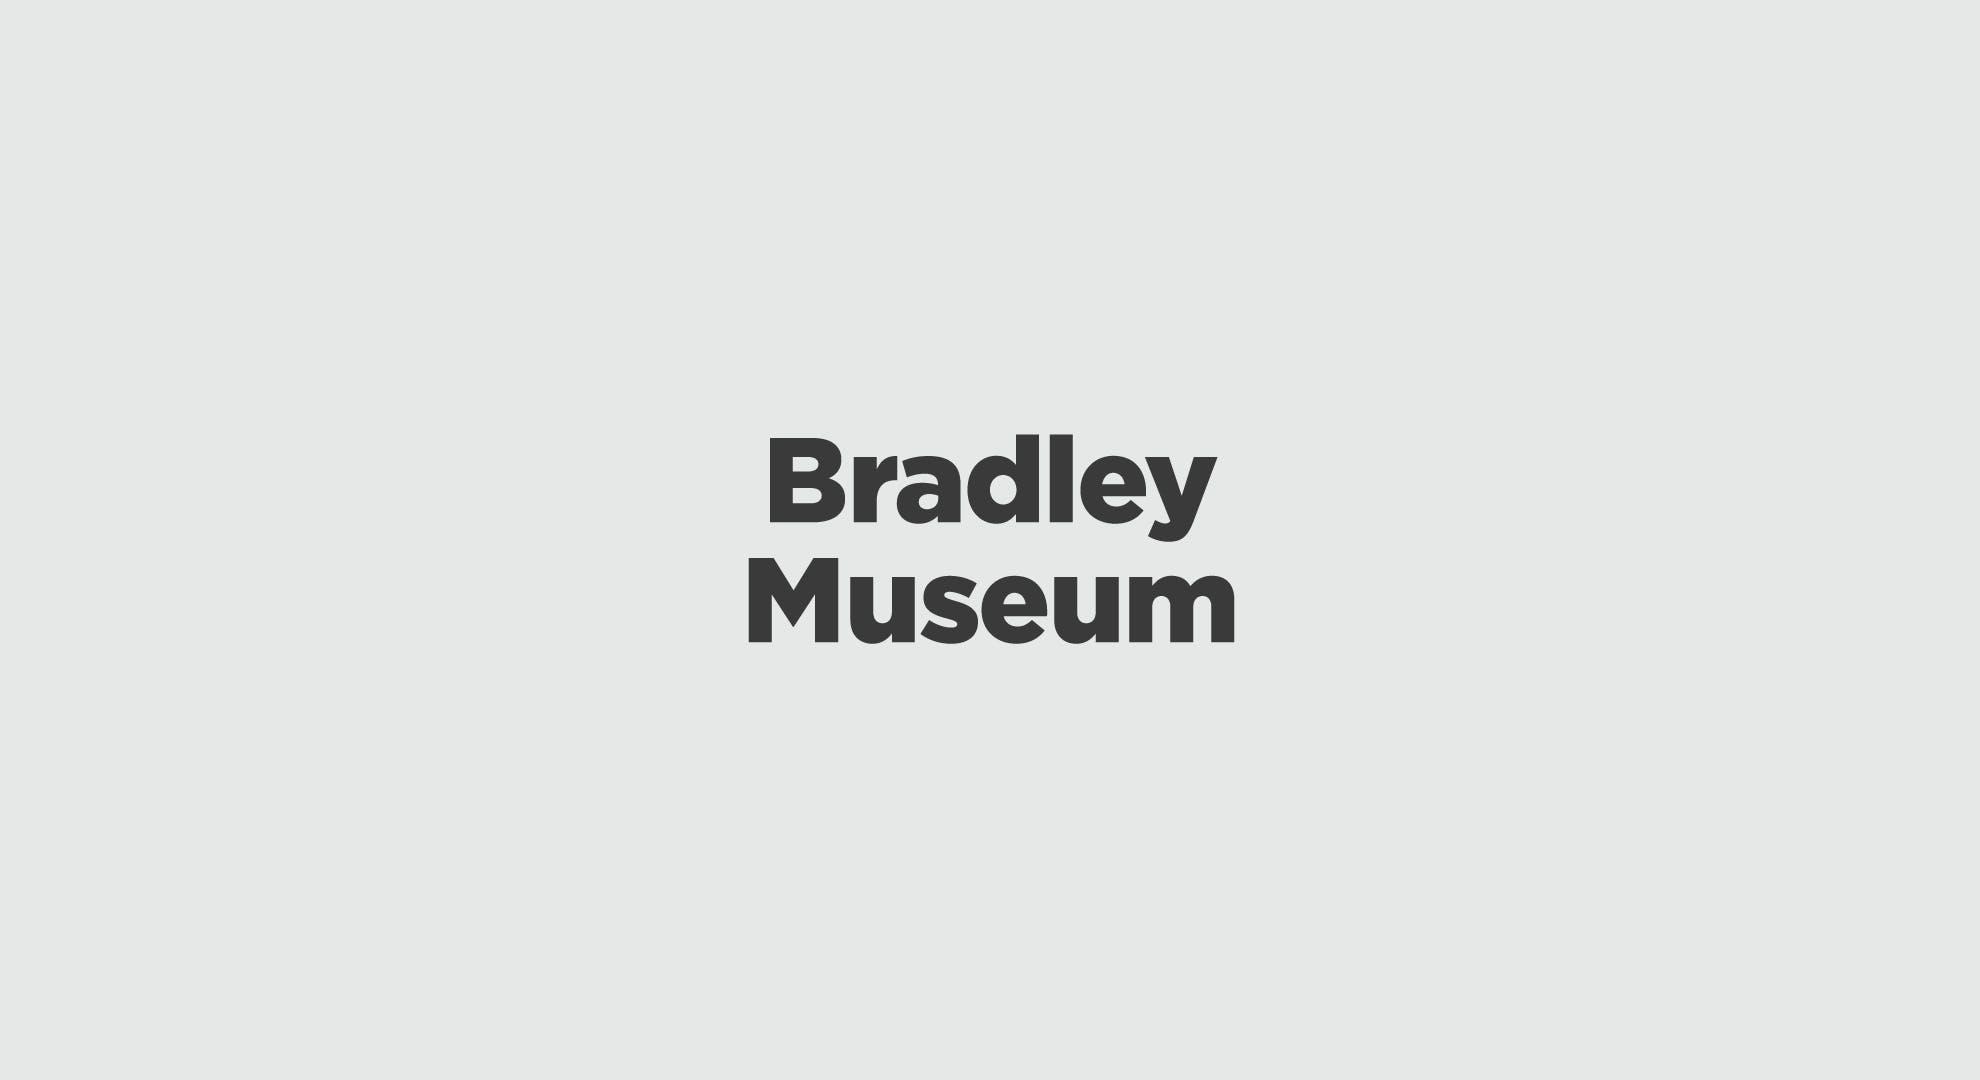 Bradley Museum